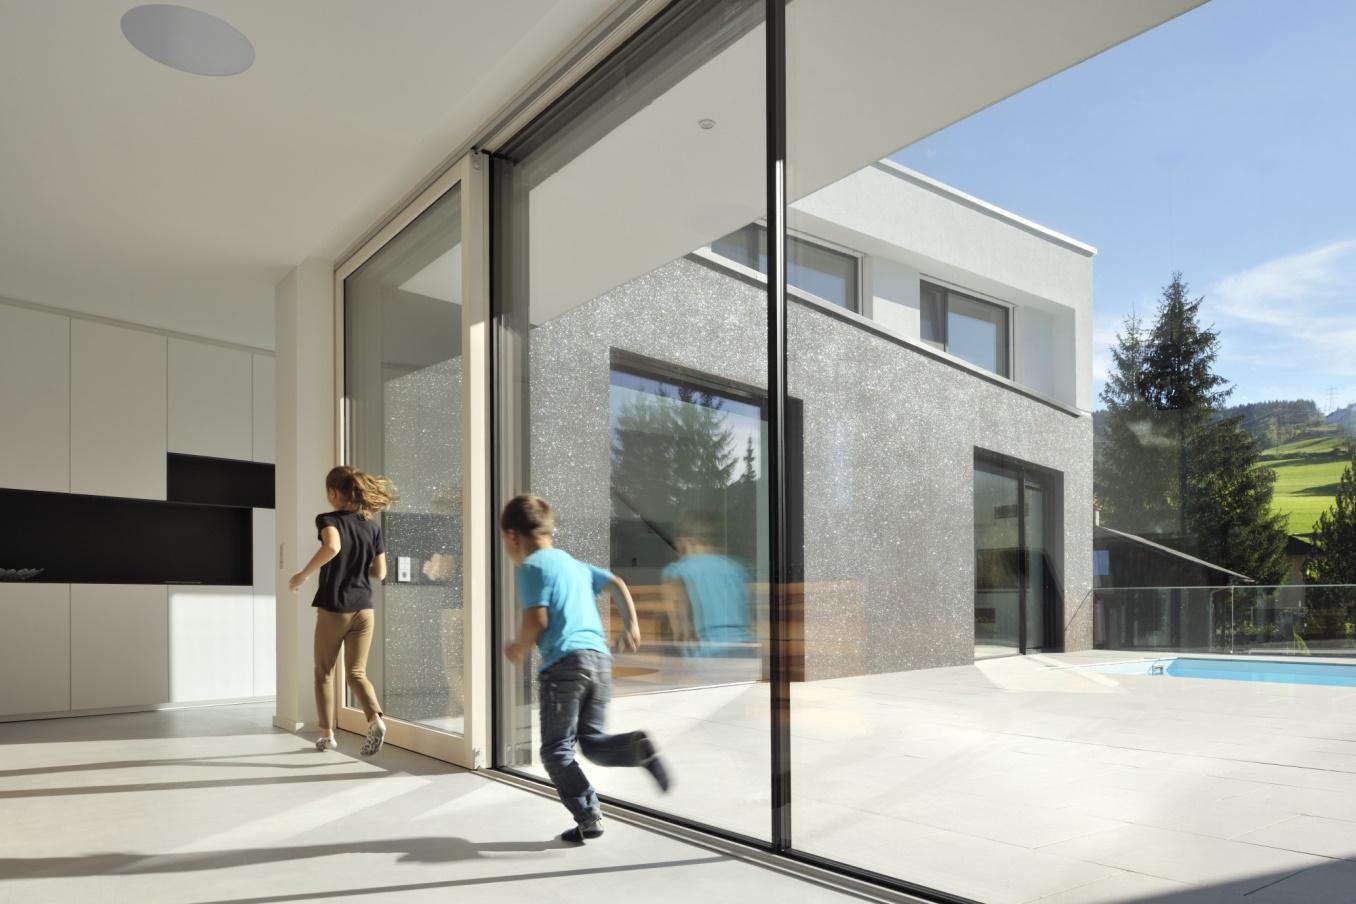 Velika drsna lesena okna